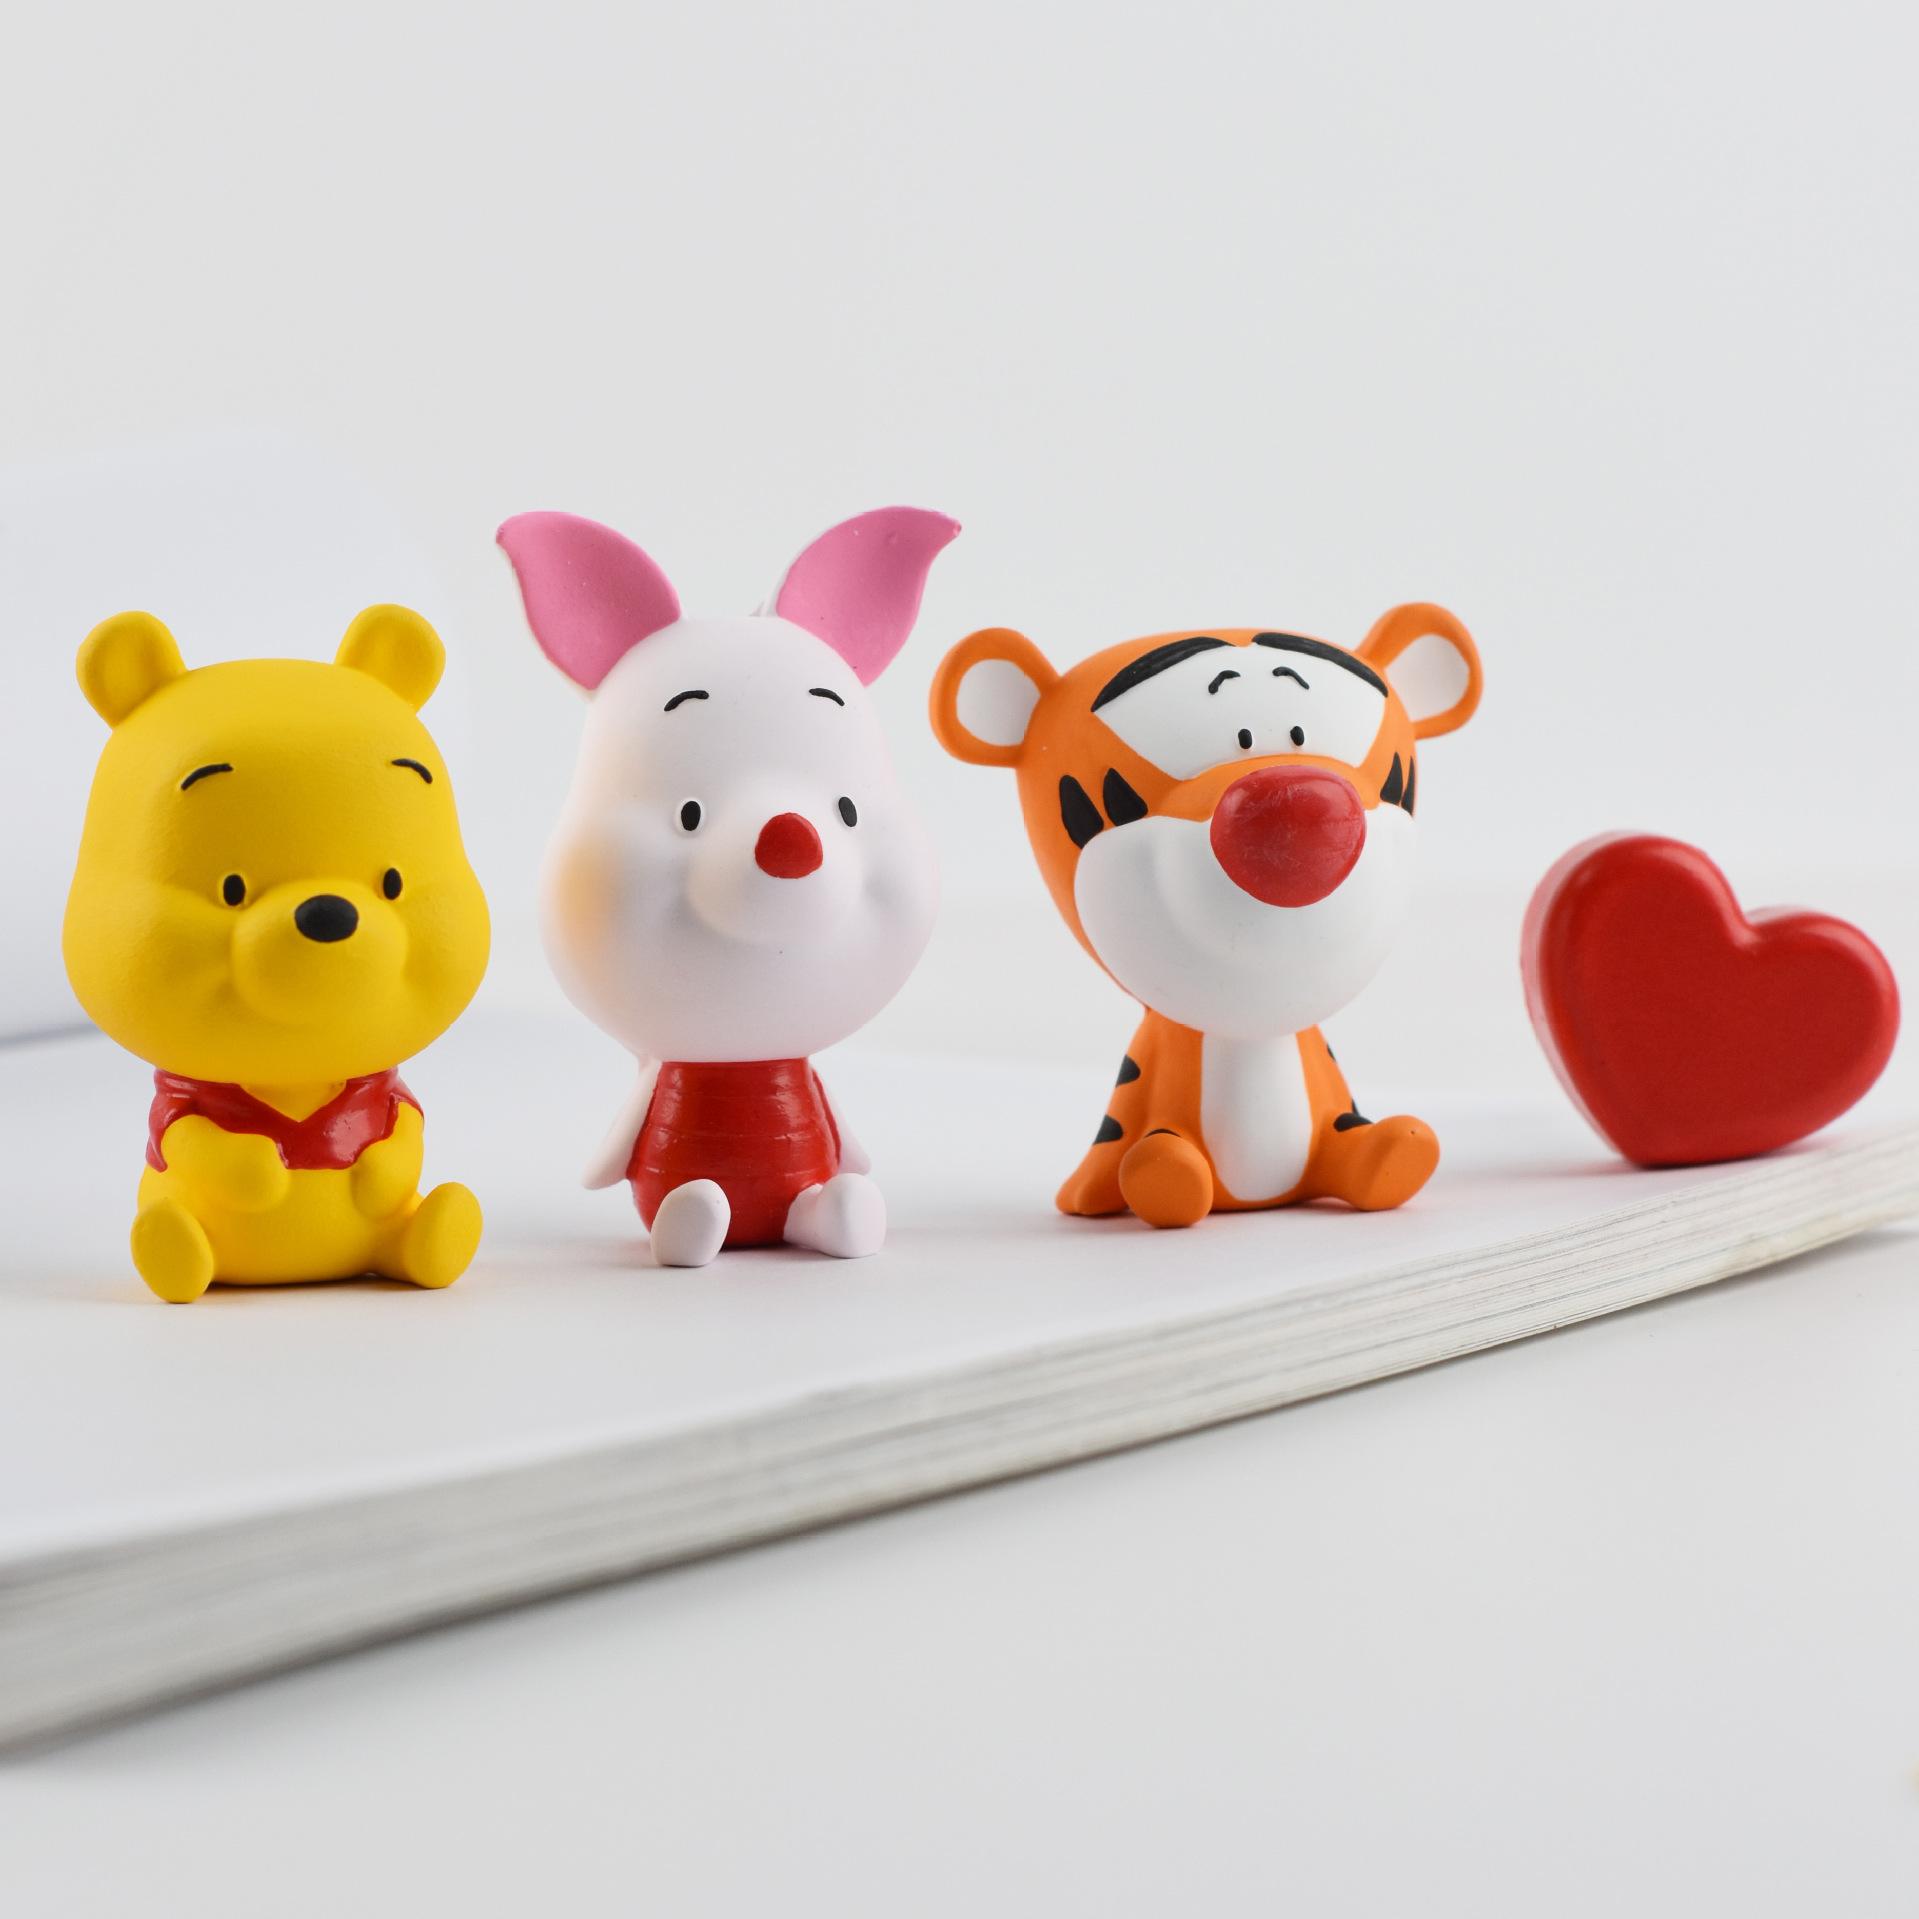 BAIRUIXIANG nước hoa Car perfume aromatherapy piggy car with cute Pooh bear jumping tiger car air ou